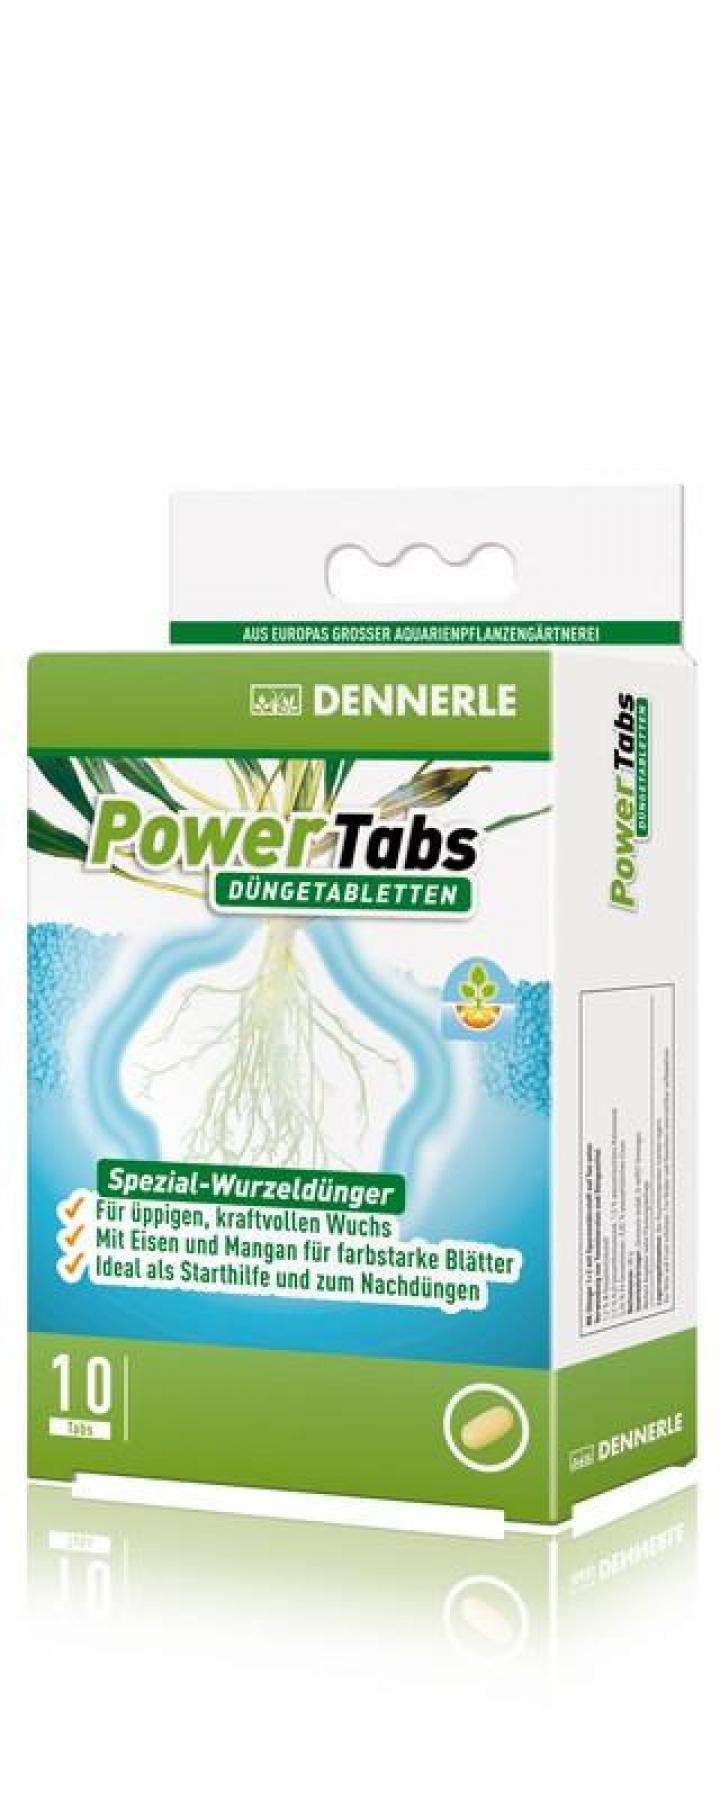 Dennerle - Power Tabs 10 Stk